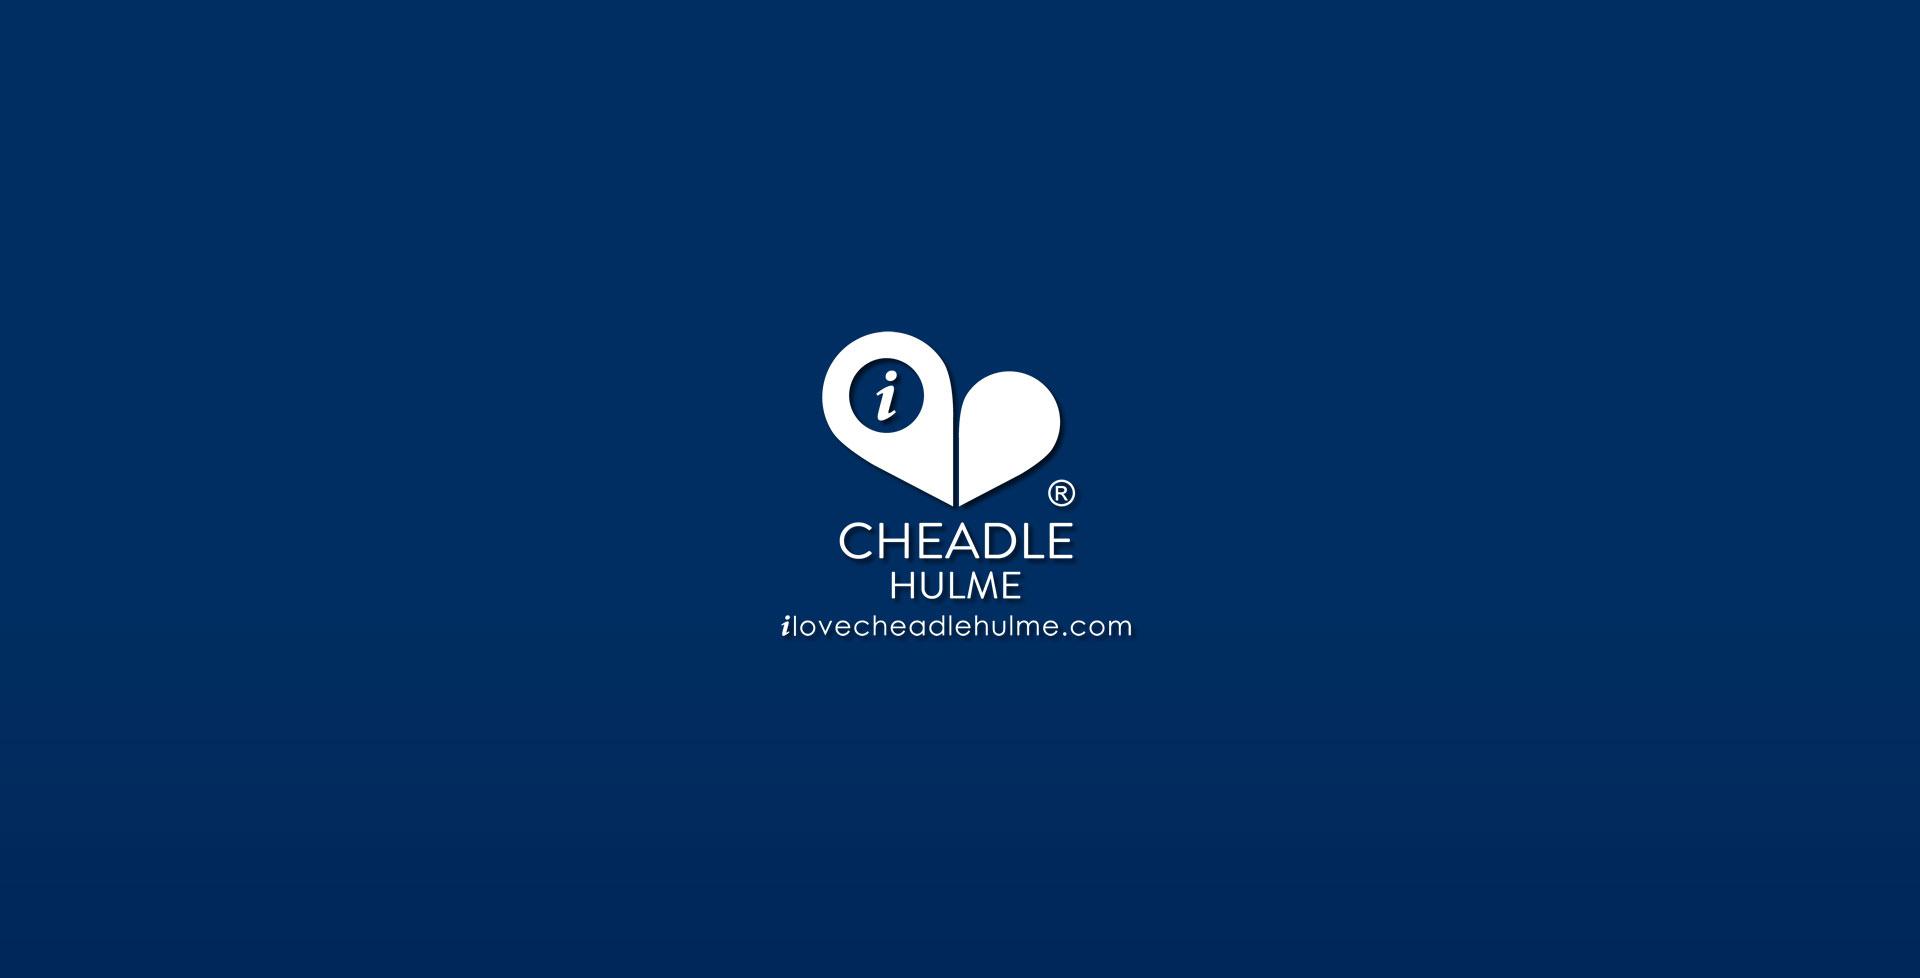 I Love Cheadle Hulme!